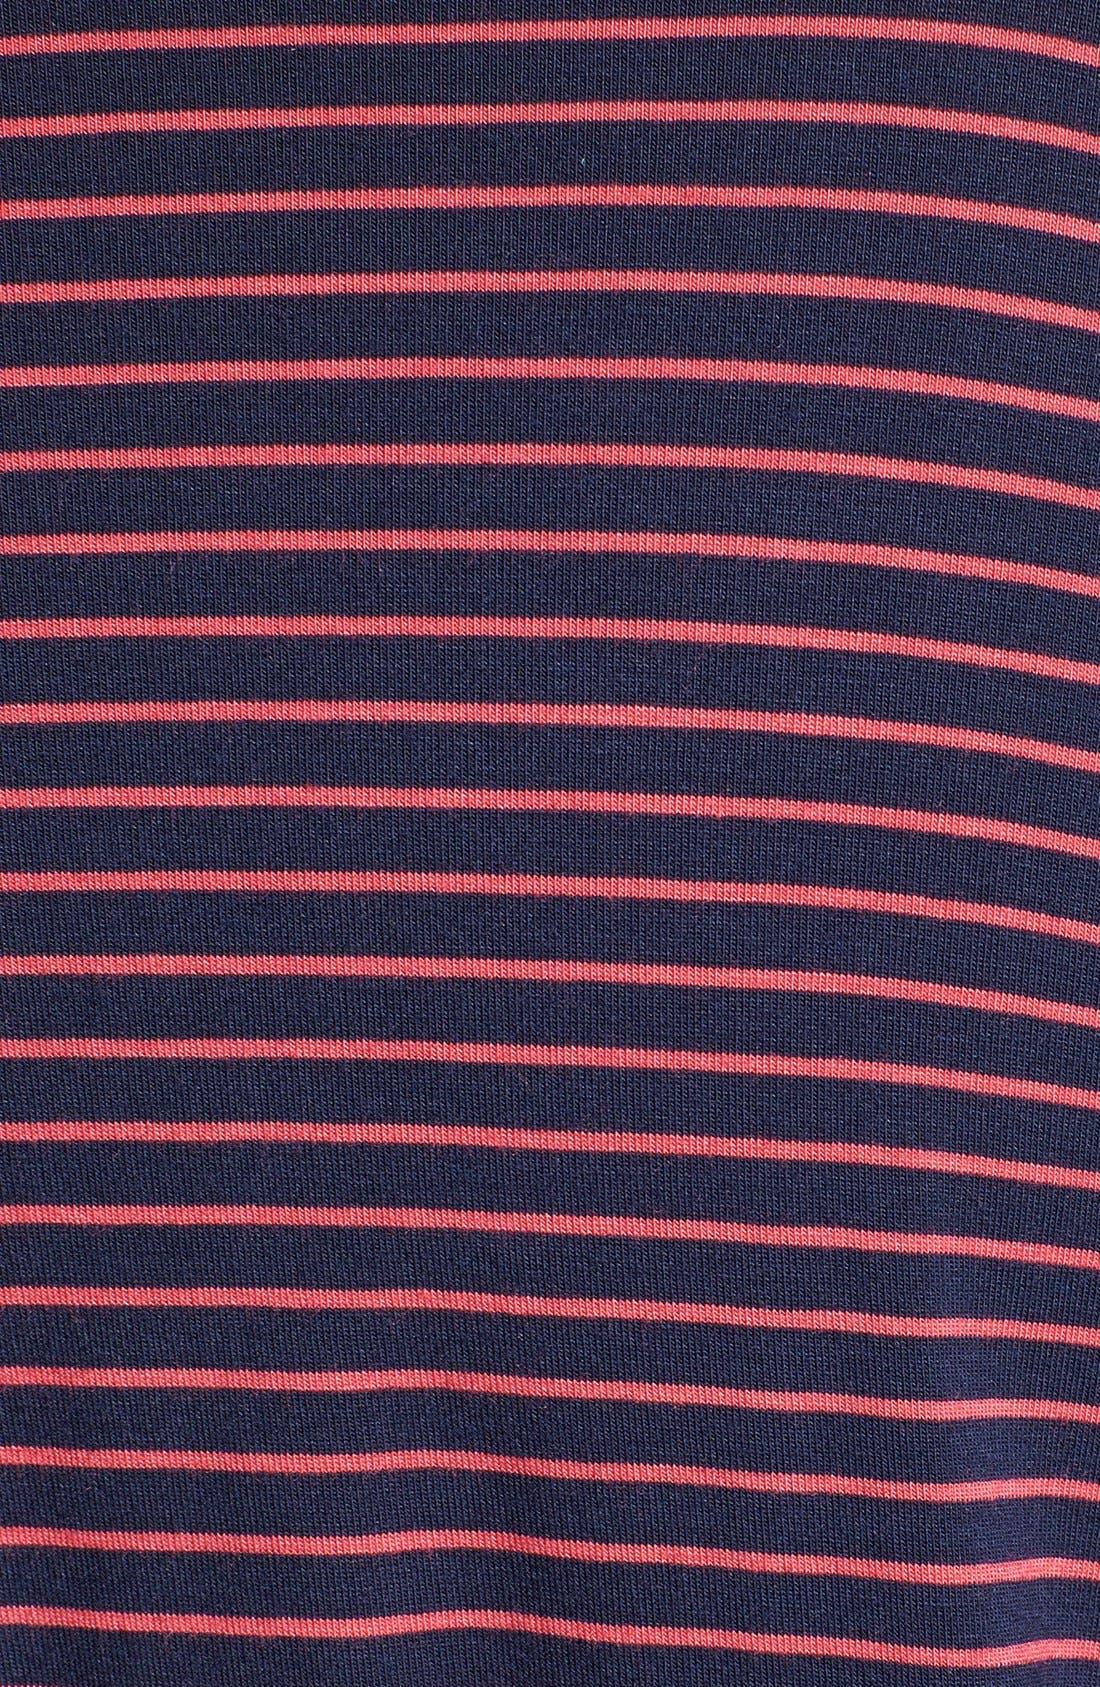 Alternate Image 3  - Caslon® Three Quarter Sleeve Knit Dress (Plus Size)